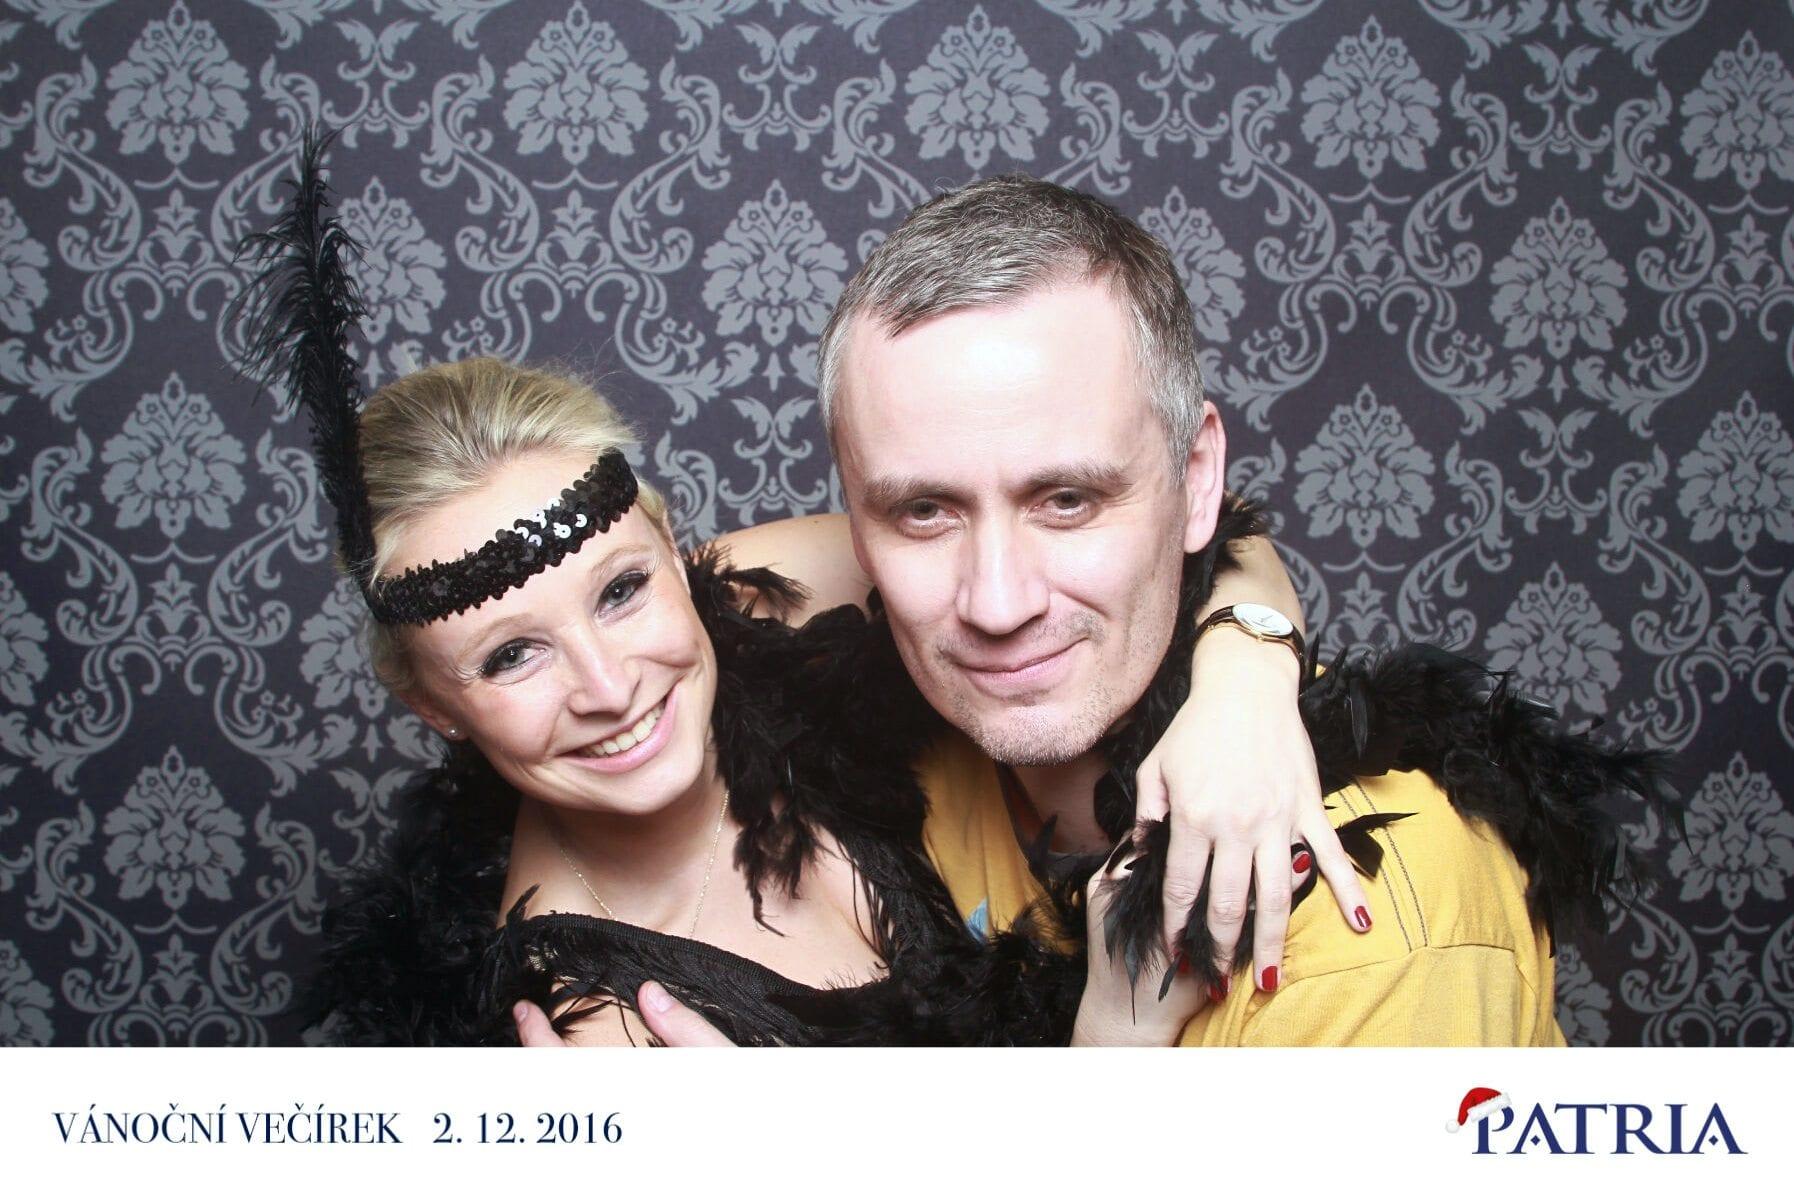 fotokoutek-patria-2-12-2016-173673